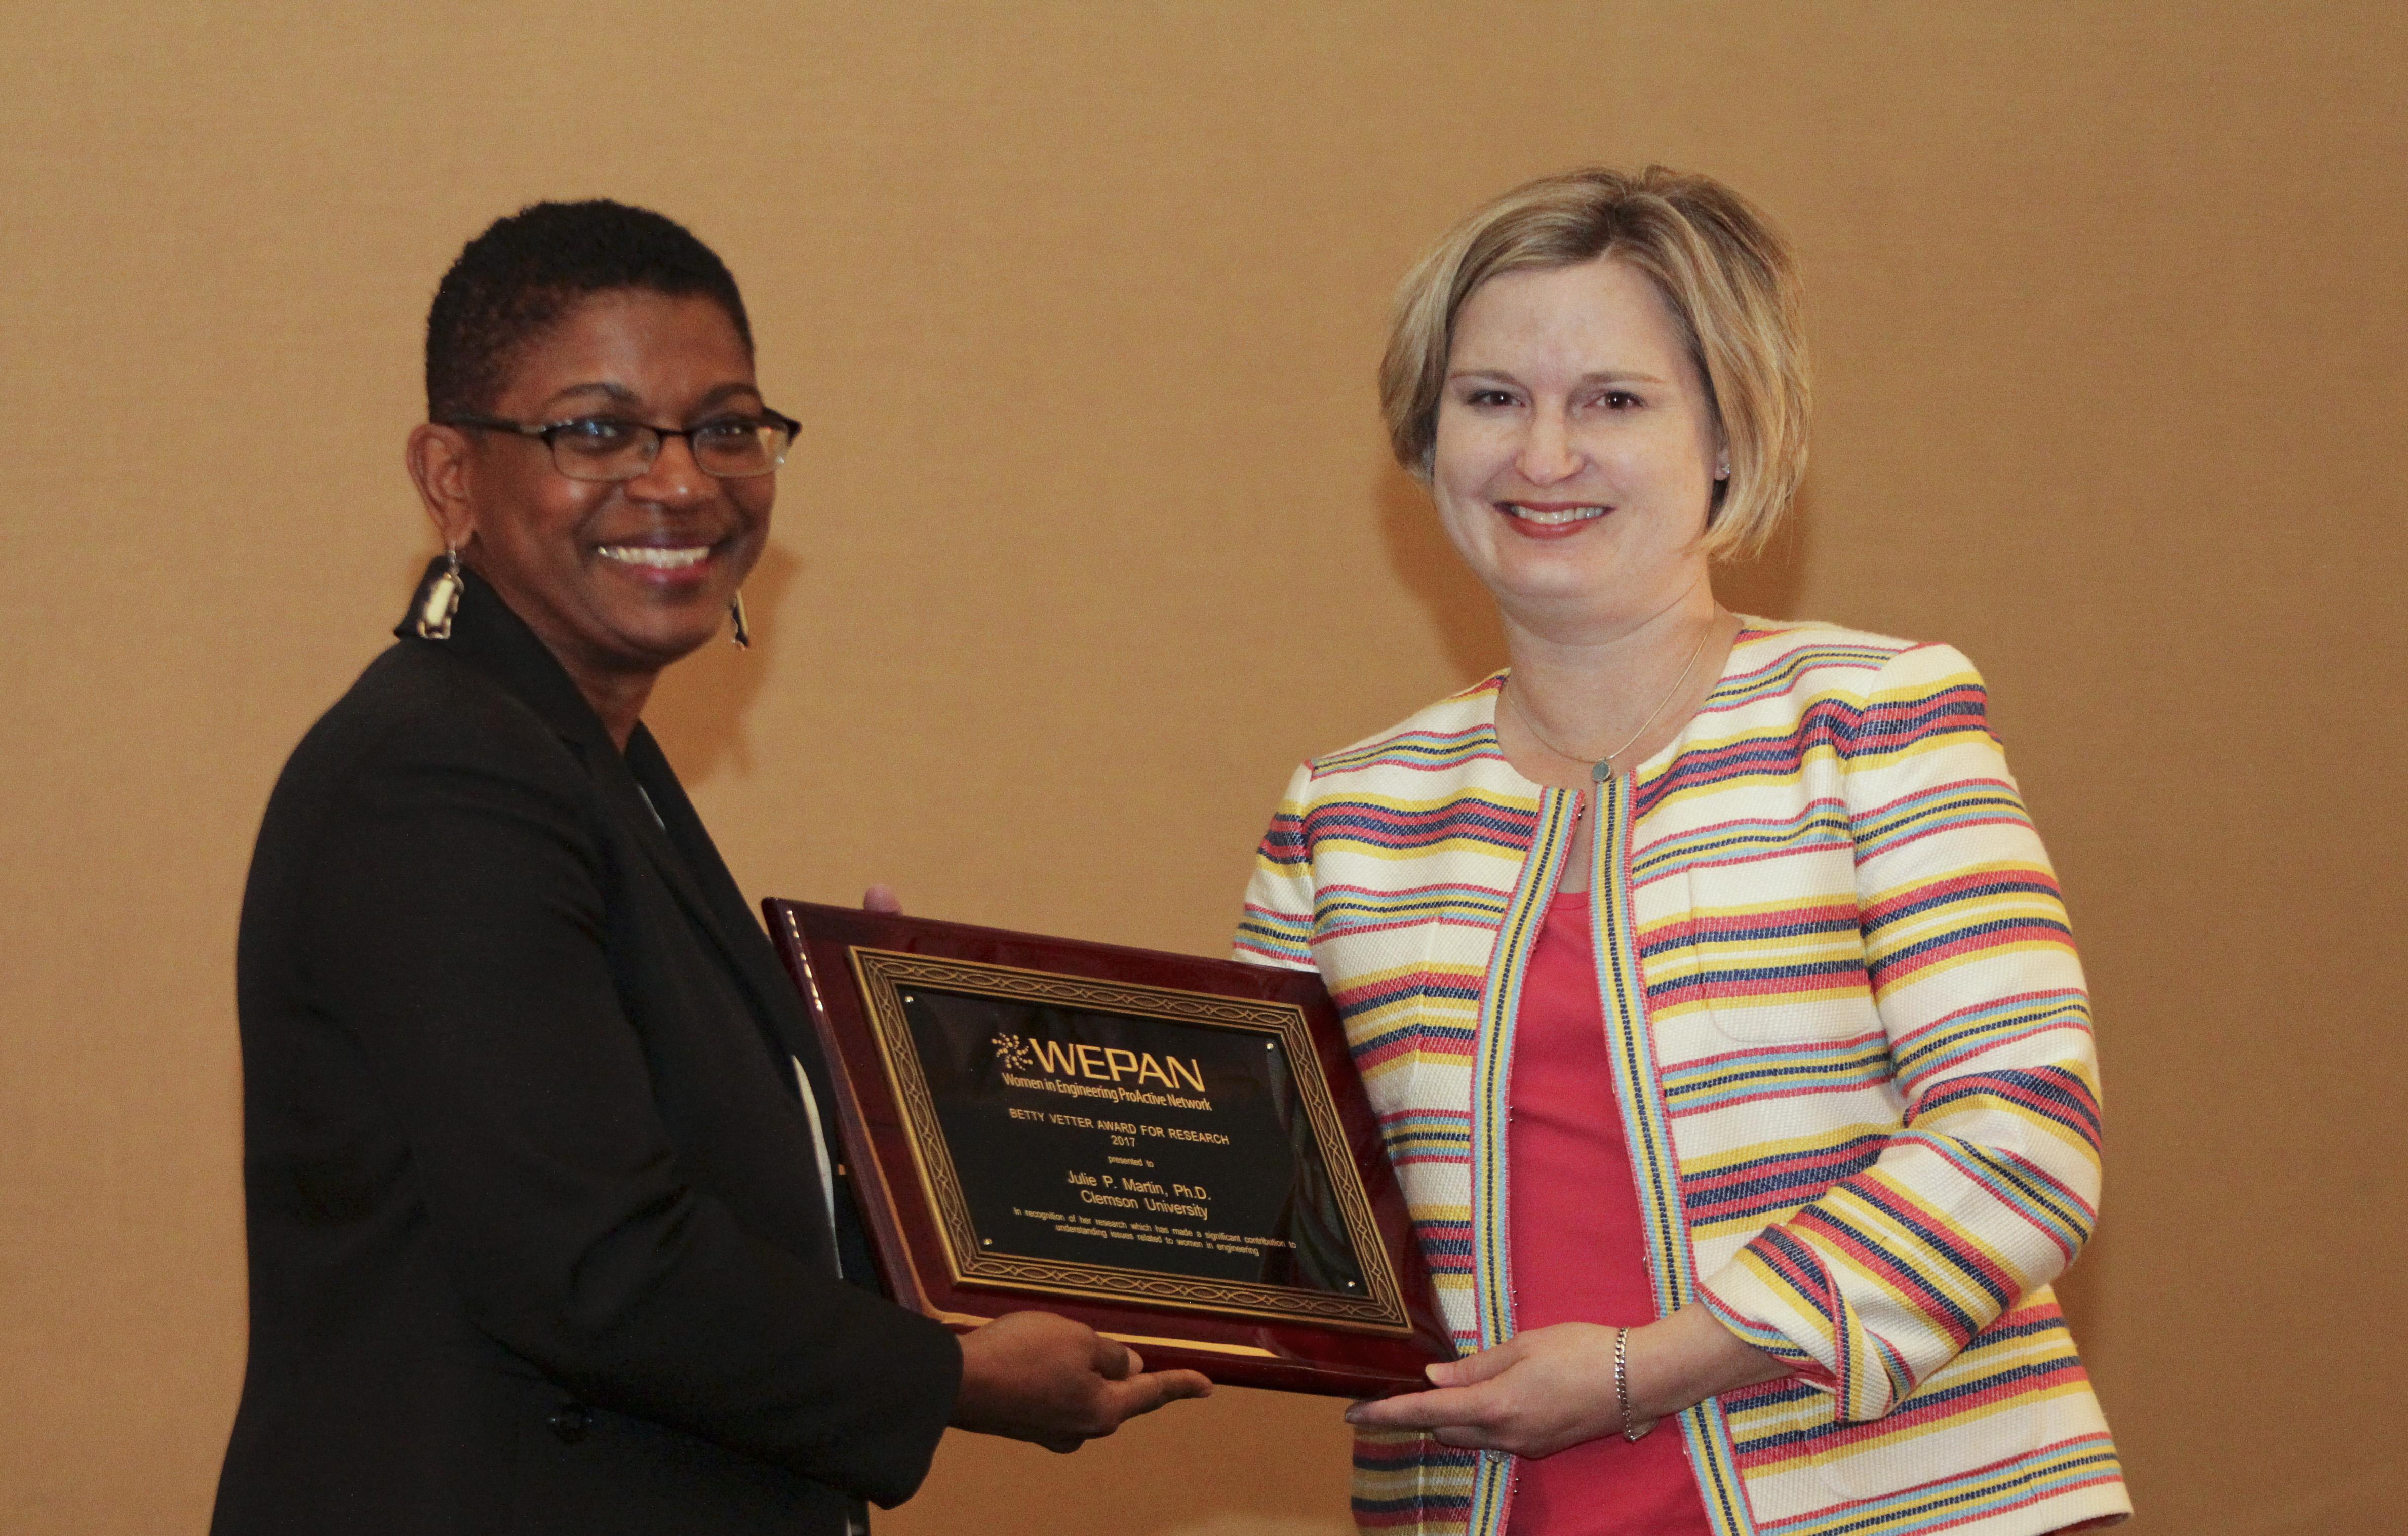 Betty Vetter Award